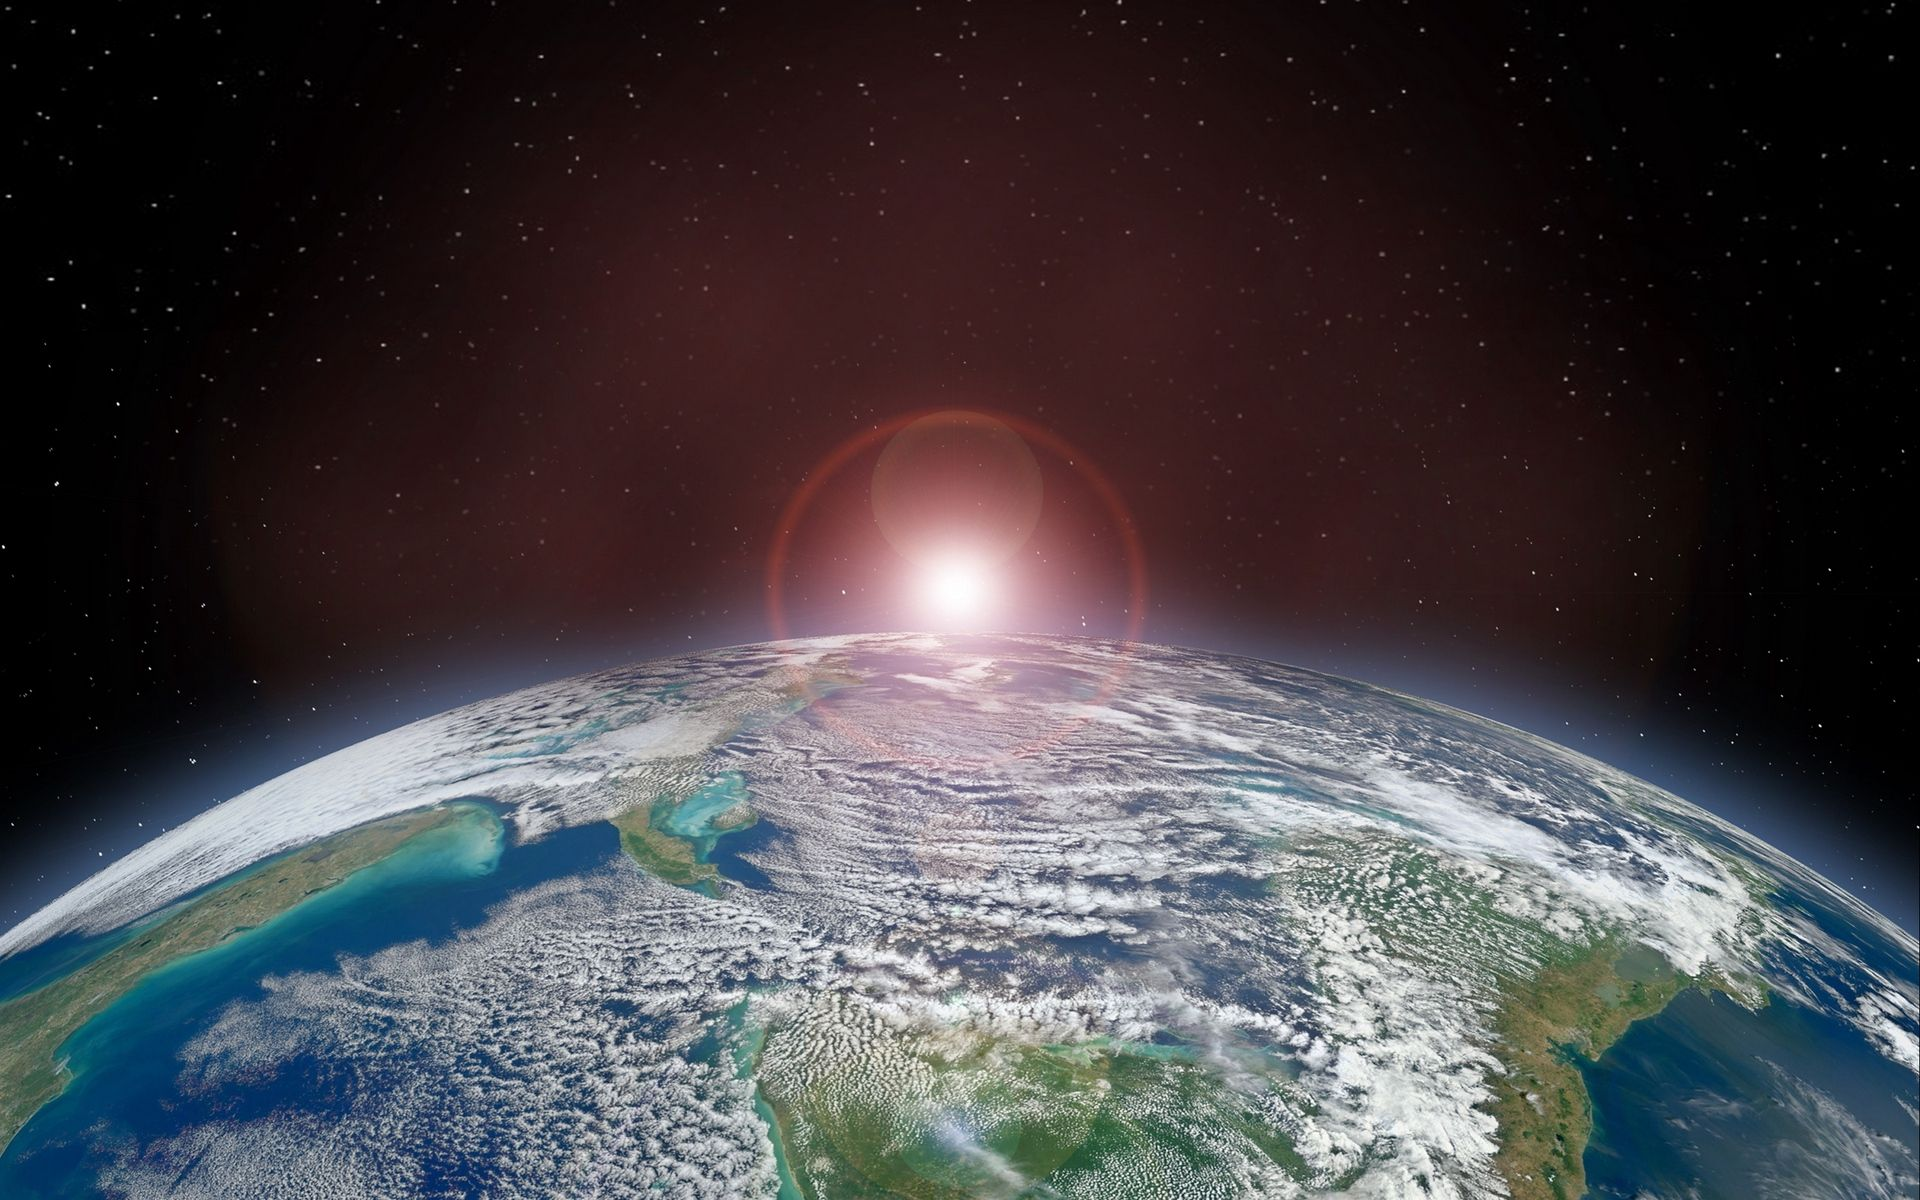 Earth surface HD wallpaper Wallpaper, Hd wallpaper